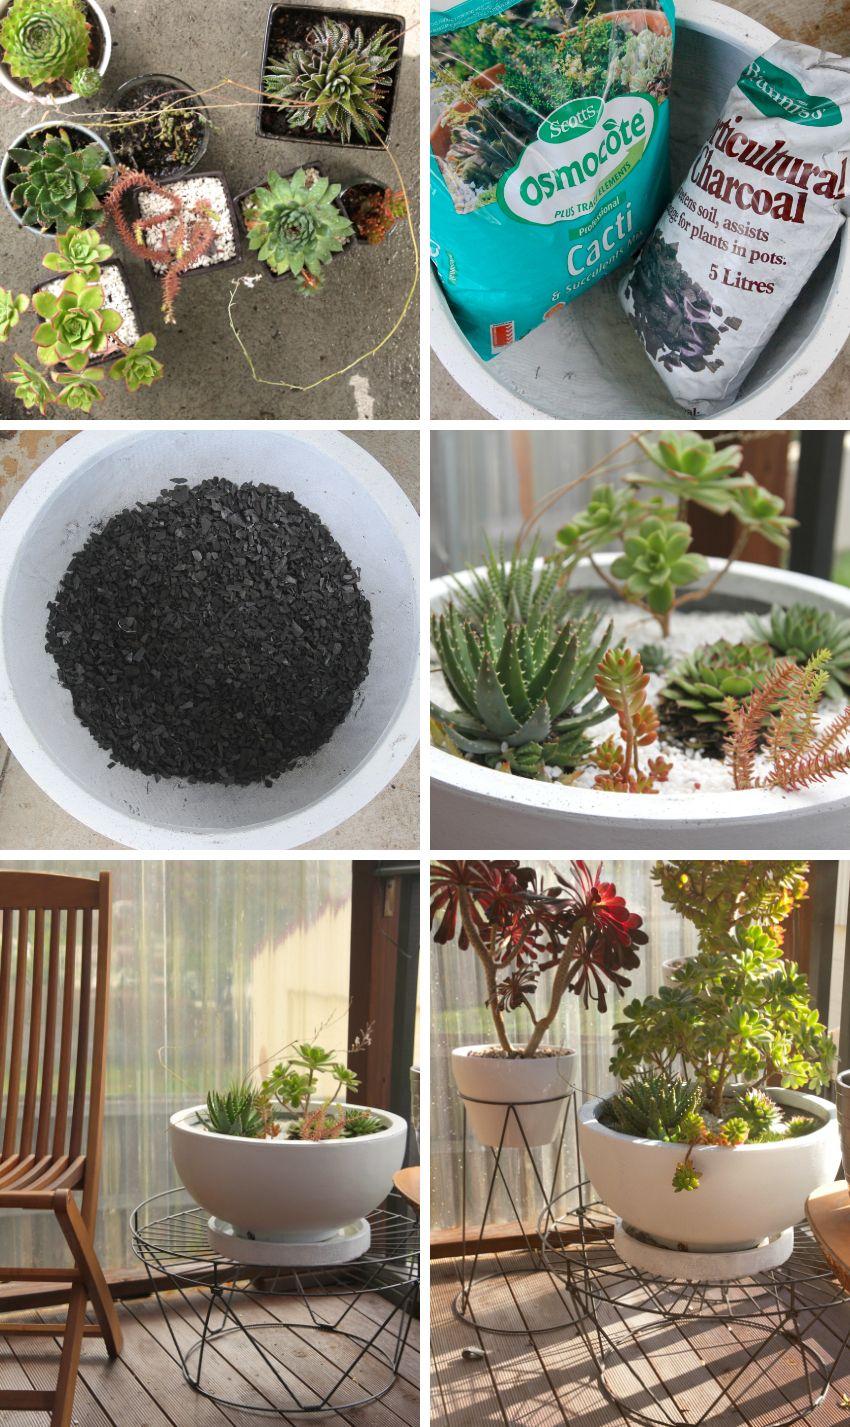 Succulent planting DIY